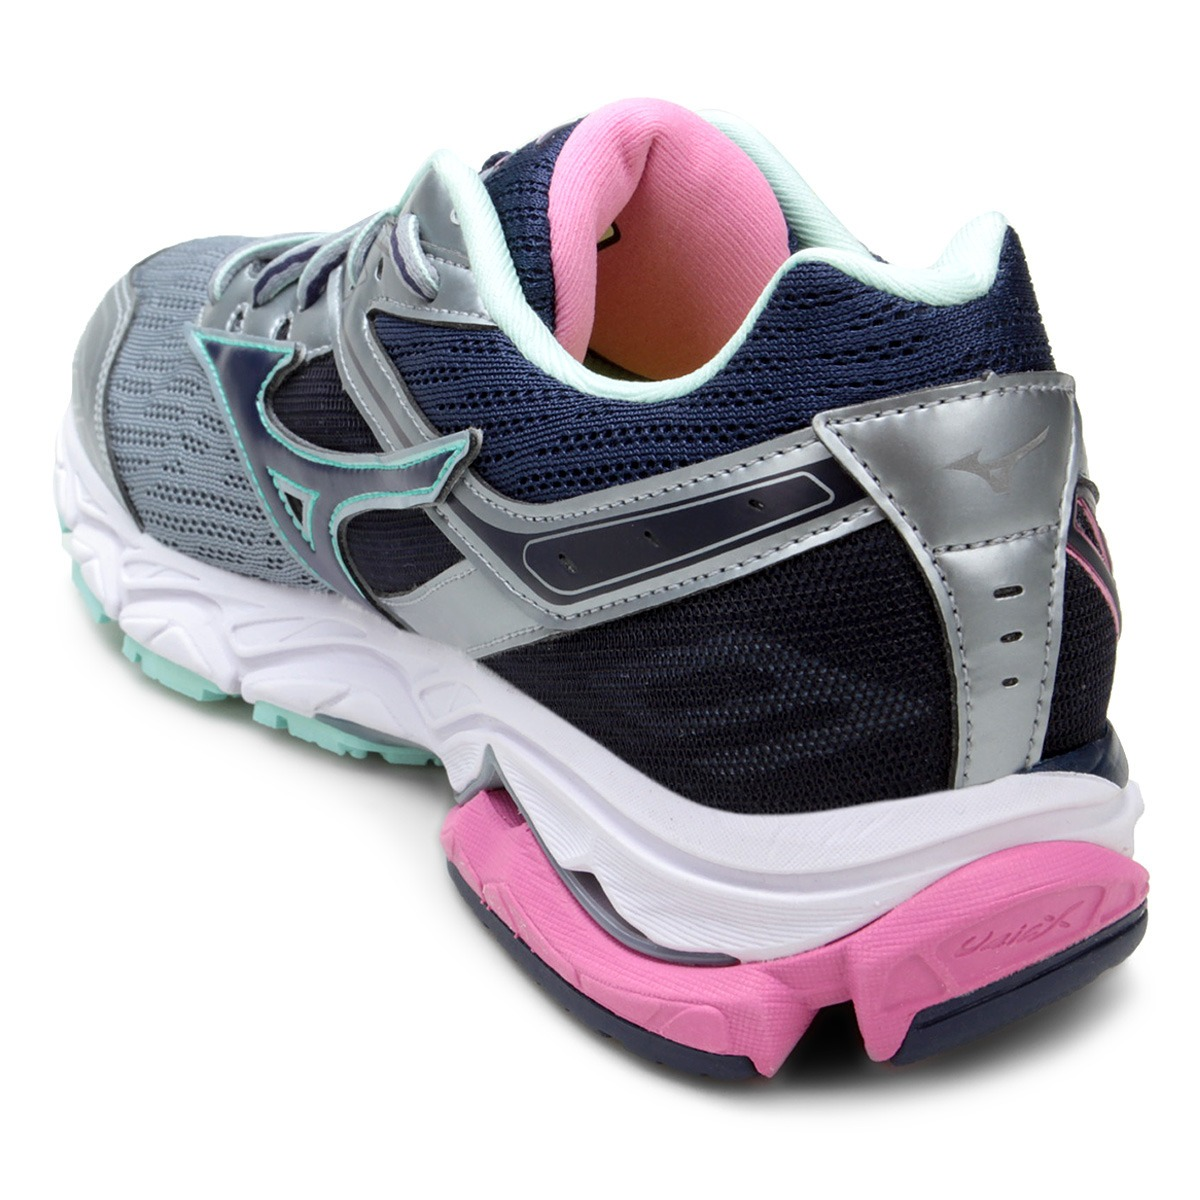 0191a562dd tênis mizuno wave ultima 9 feminino - prata e azul e rosa. Carregando zoom.